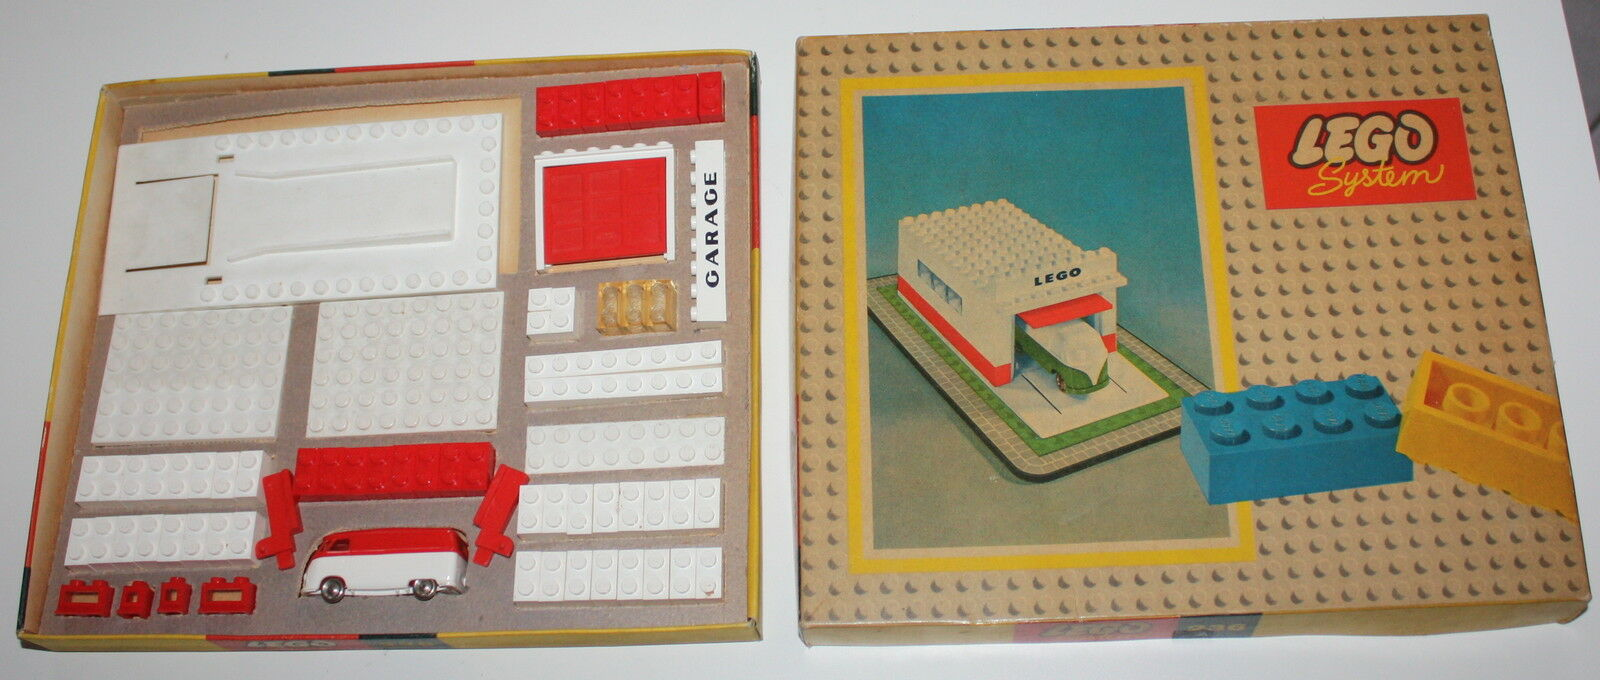 LEGO VINTAGE SET 236 Garage   automatic automatic automatic door 1958 RARISSIMA VARIANTE DI BOX da1a6f